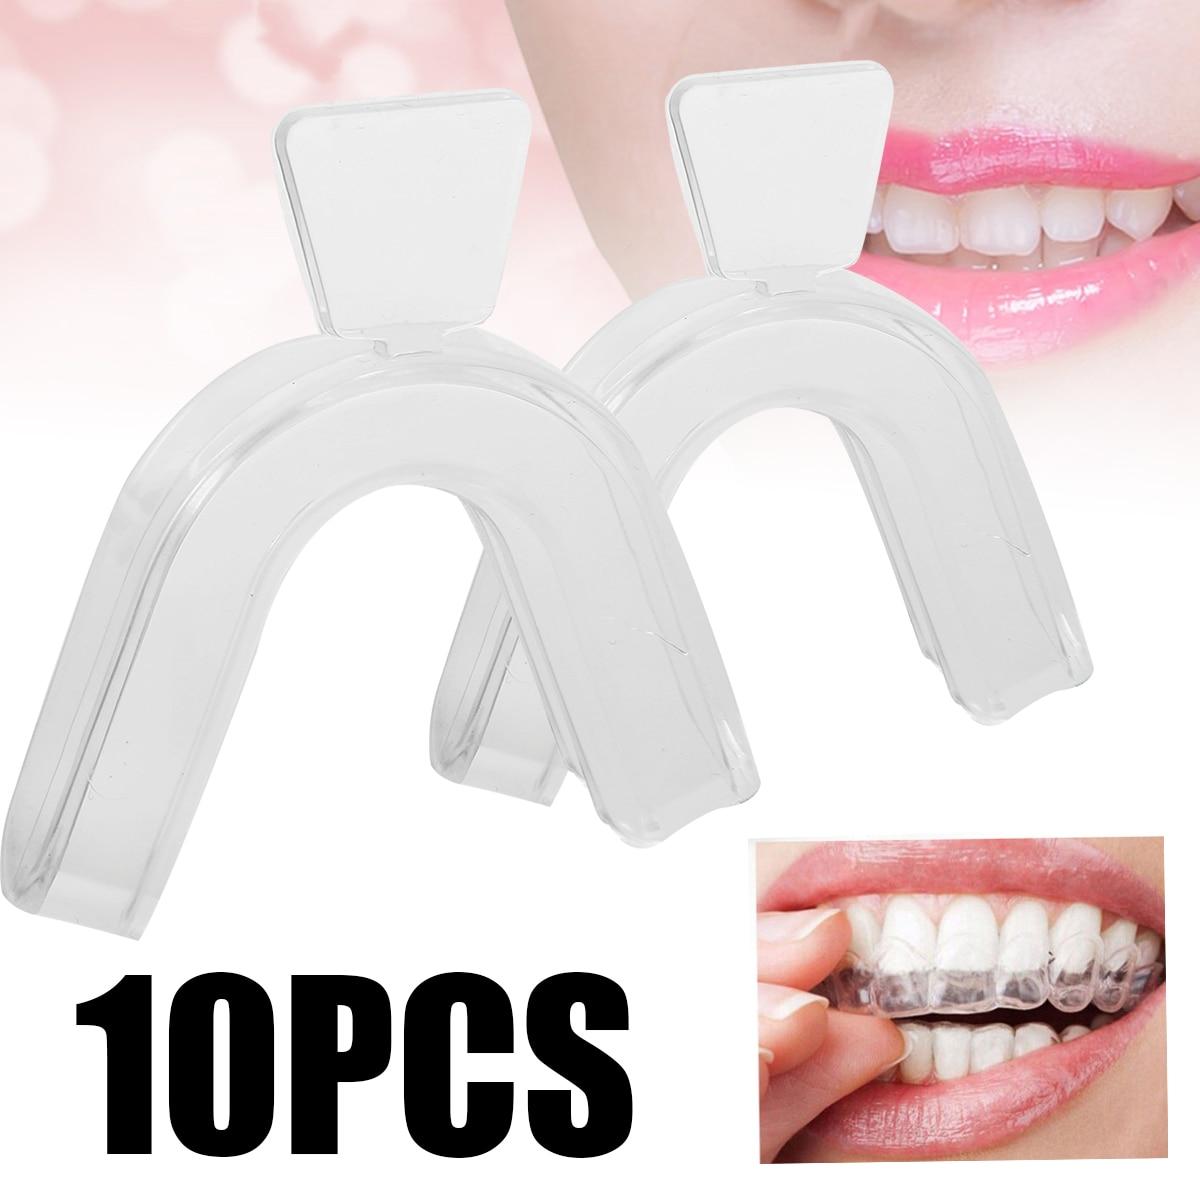 10pcs Food Grade Silicone Teeth Whitening Trays Dental Mouthguard Splint White Teeth Mouth Trays Guard Care Oral Hygiene